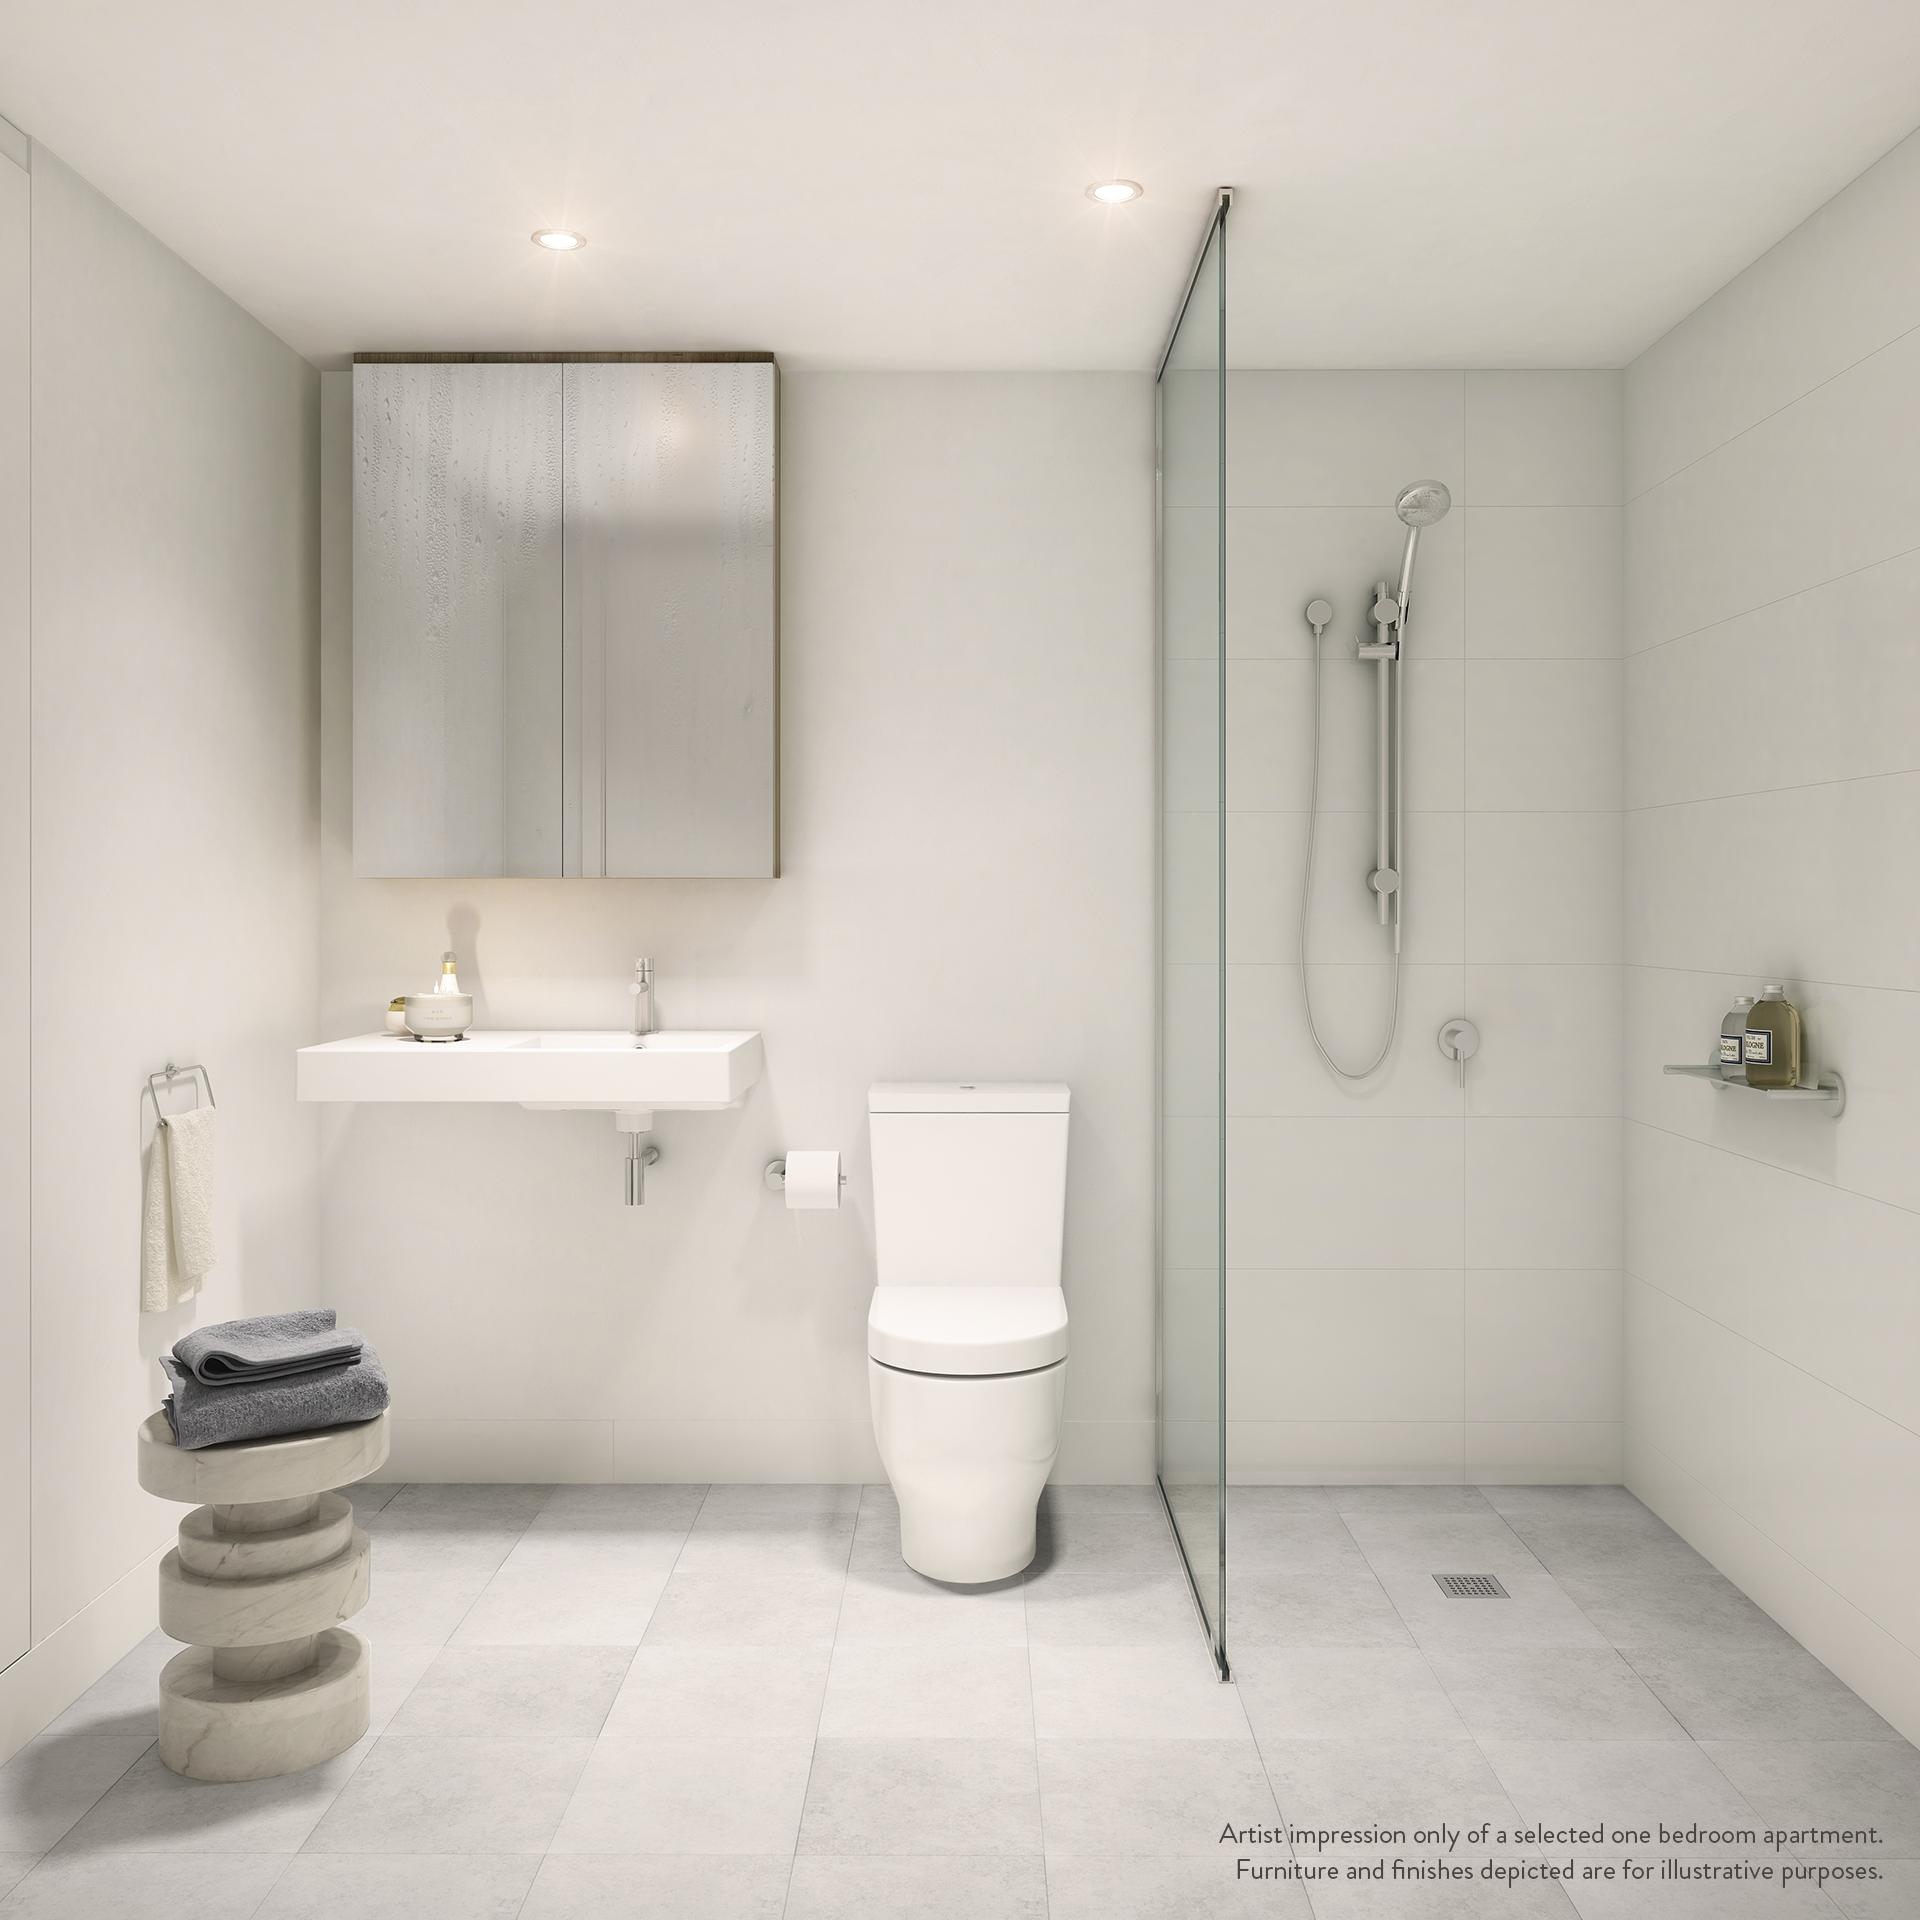 GH_A03(Bathroom)_Disclaimer